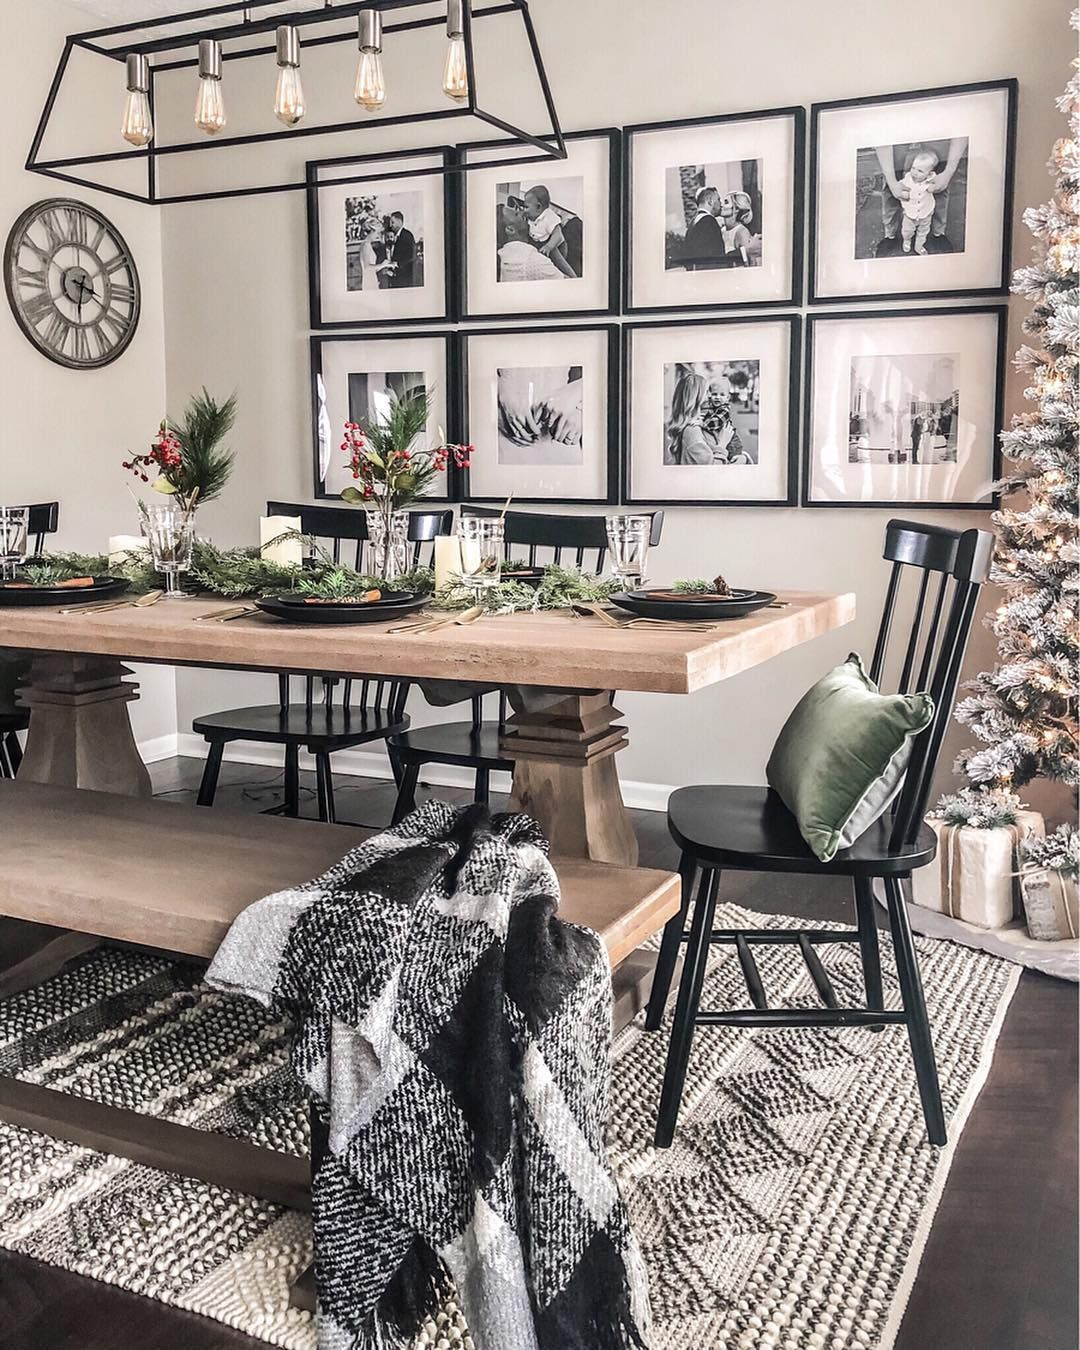 29+ Best Dining Room Wall Decor Ideas 2018 (Modern ...